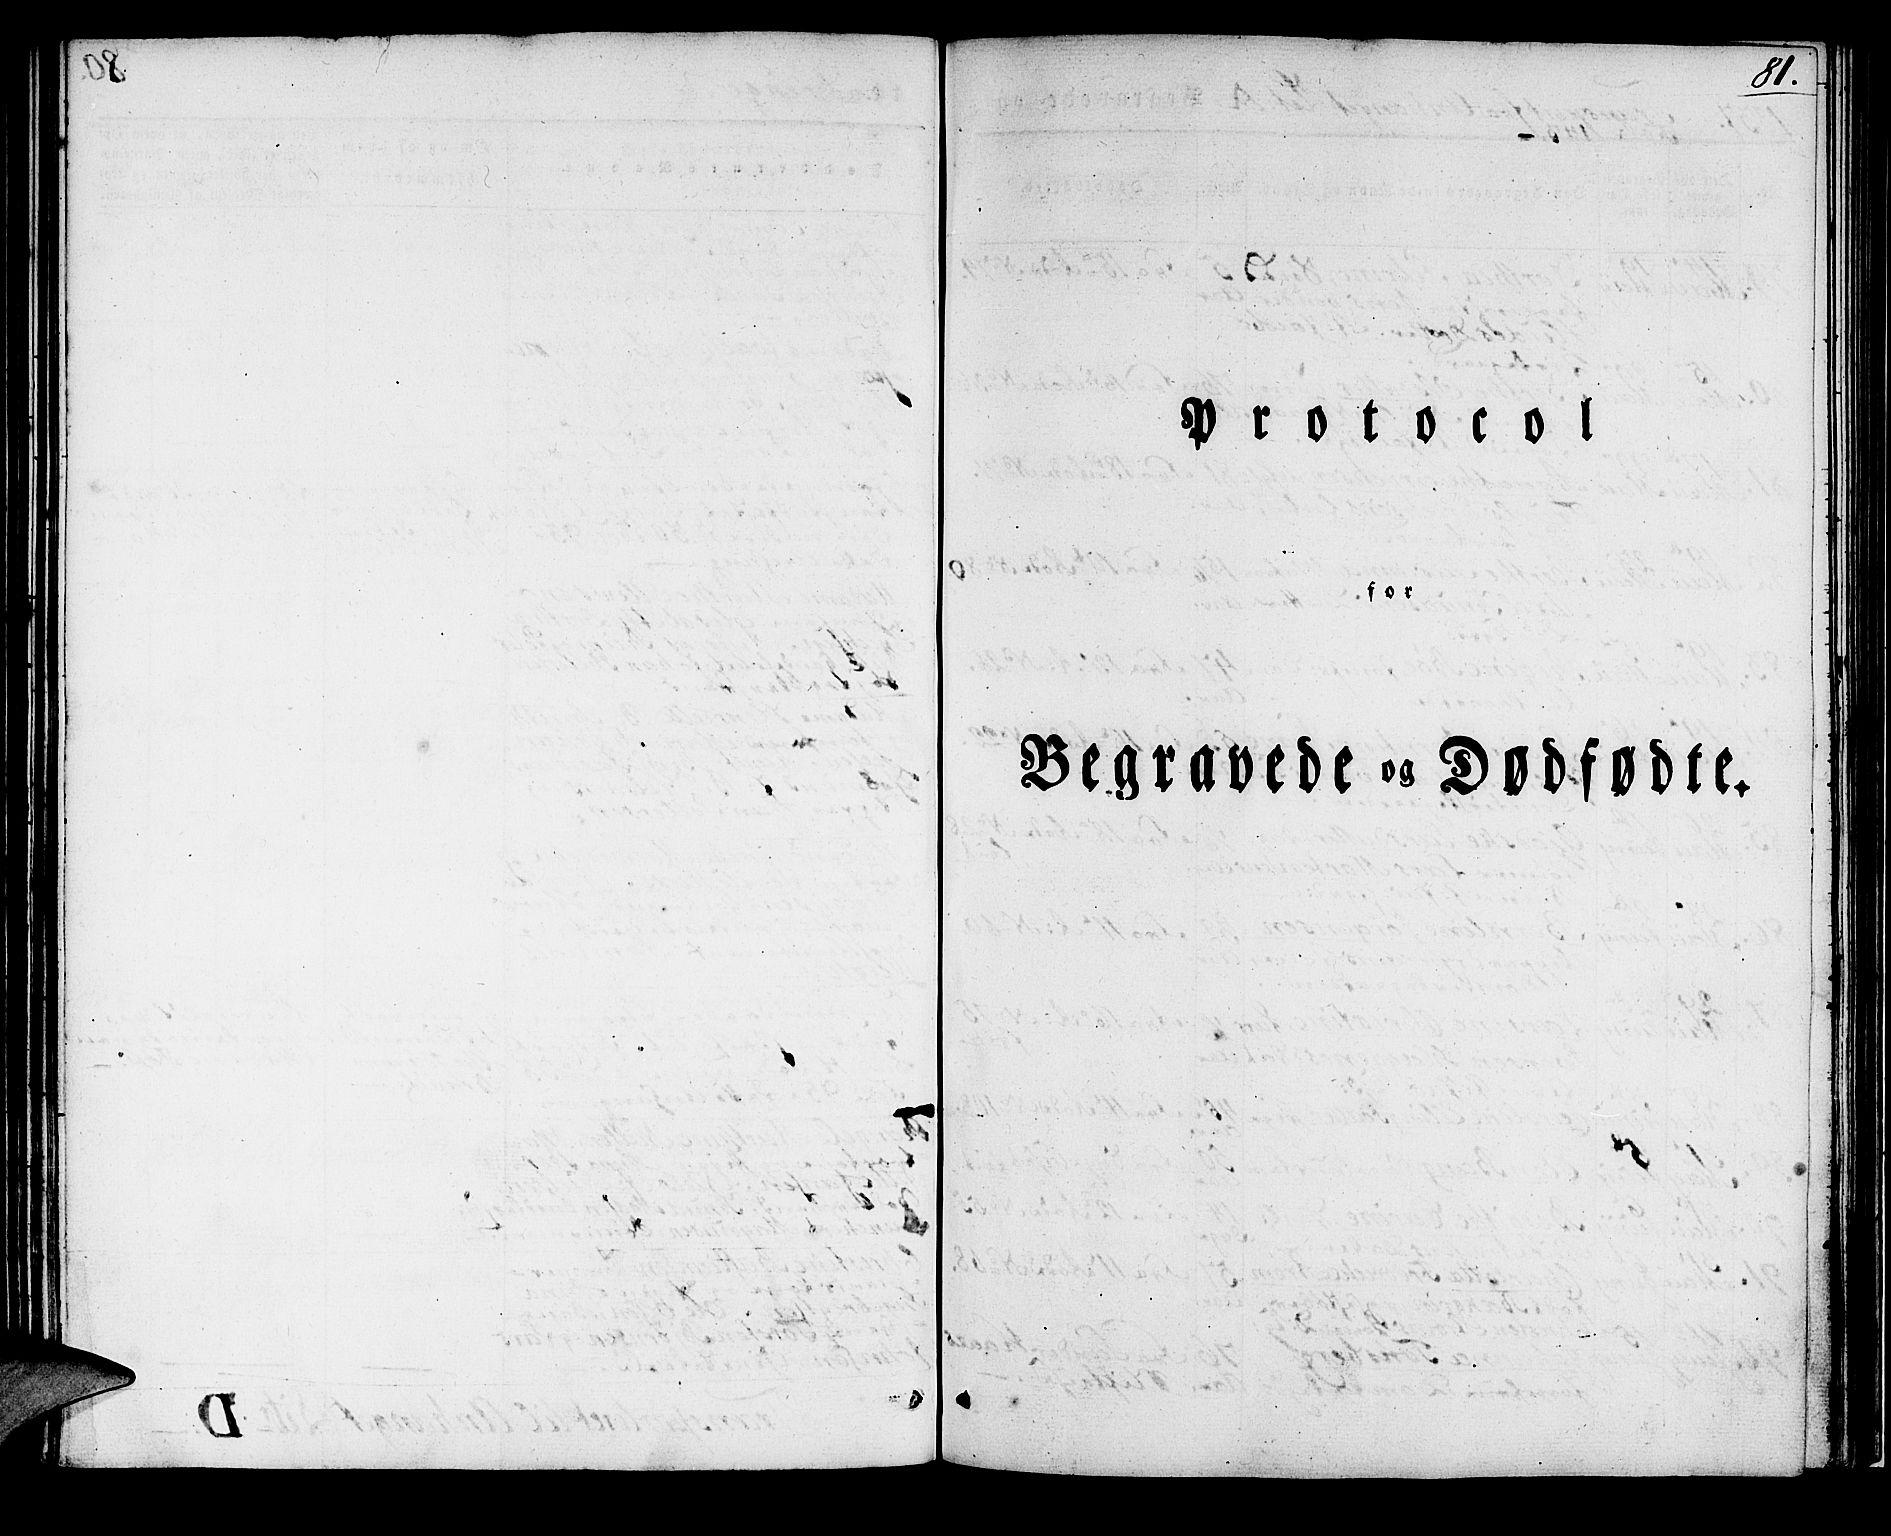 SAB, Domkirken Sokneprestembete, H/Haa/L0015: Ministerialbok nr. A 14, 1835-1840, s. 81